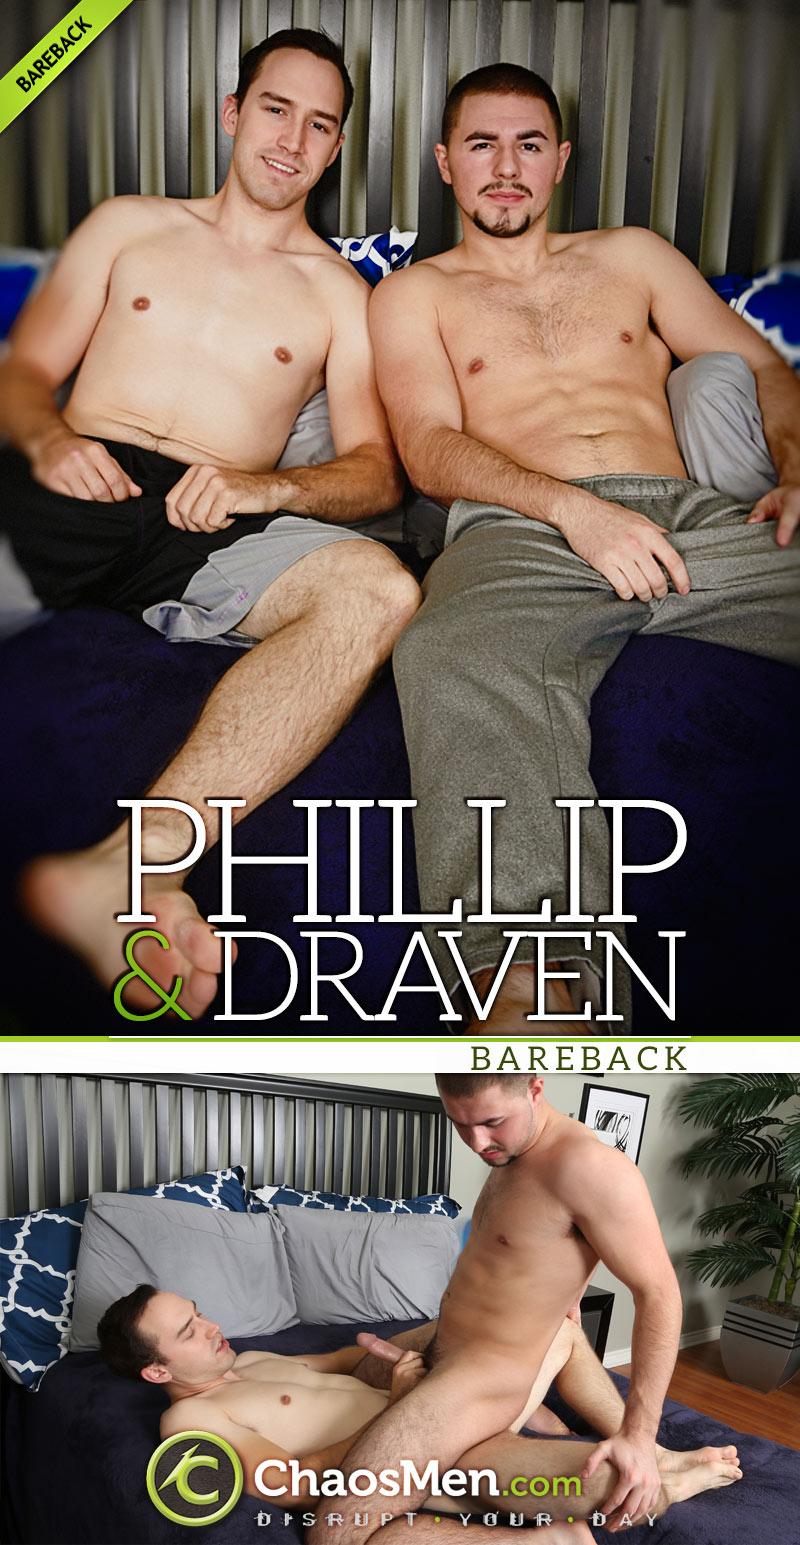 Draven Fucks Phillip (Bareback) at ChaosMen